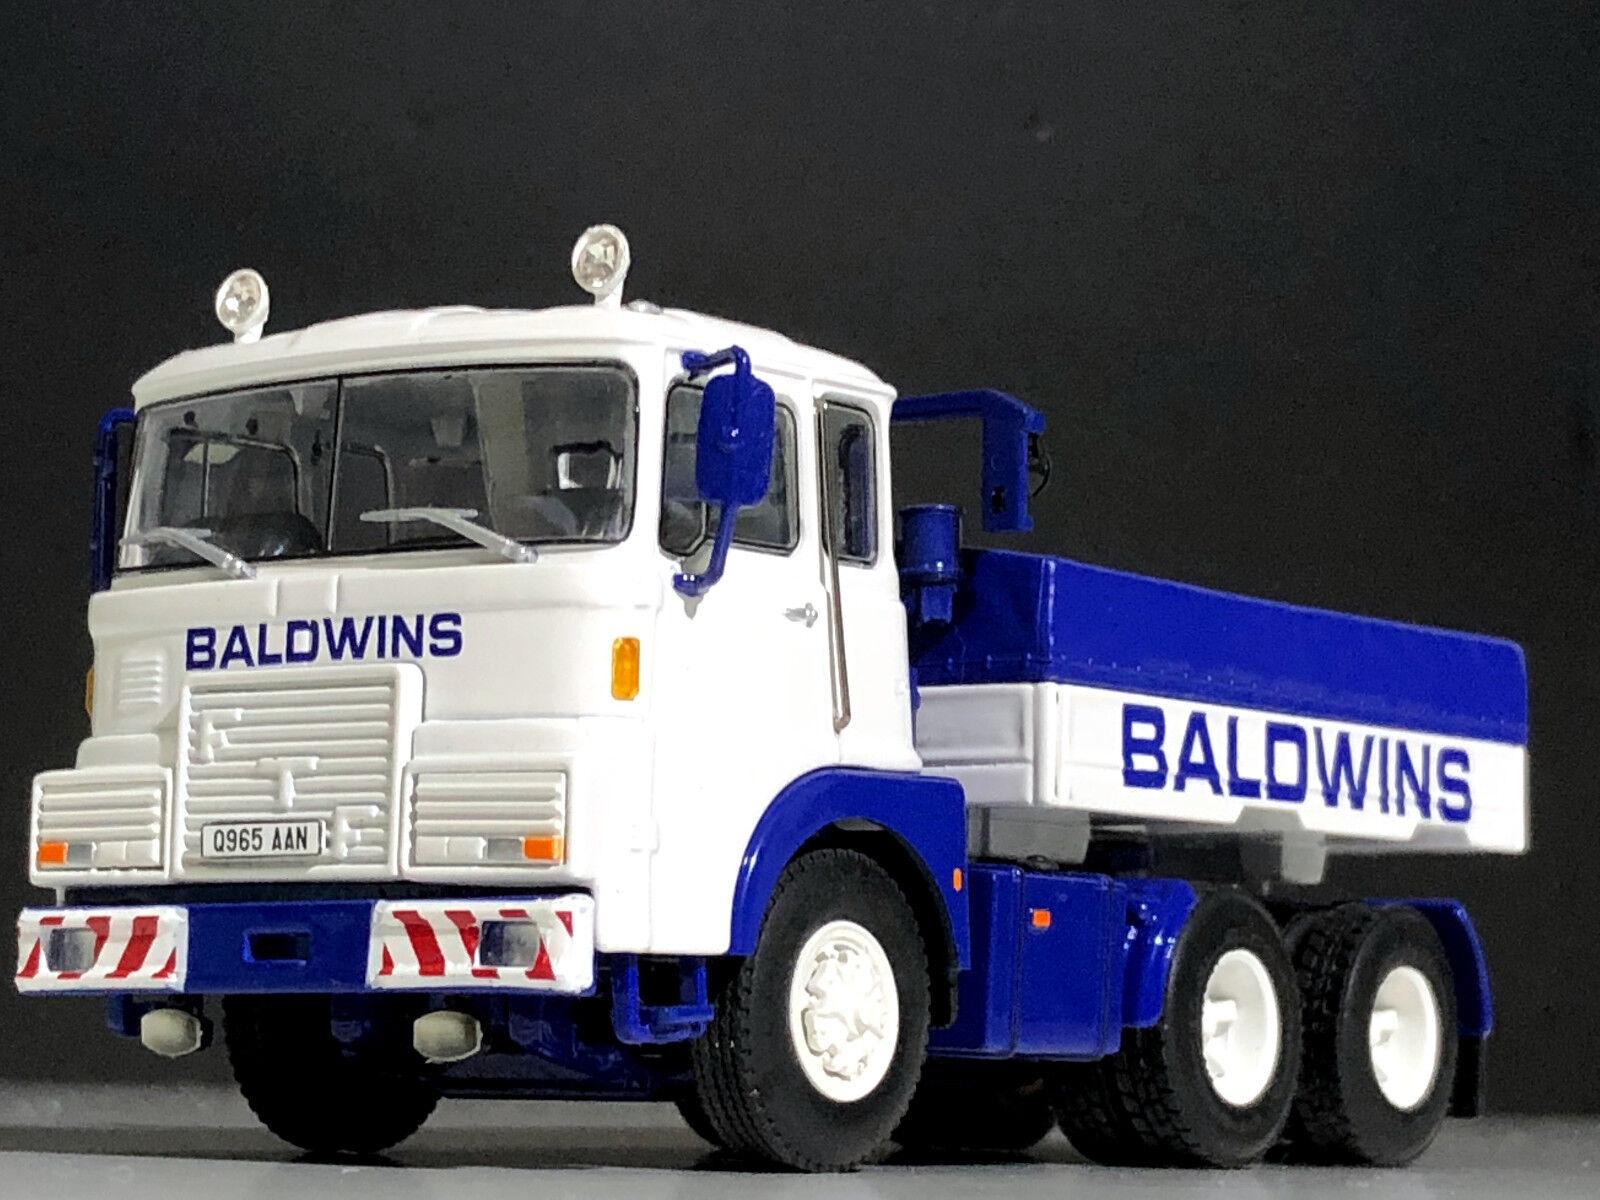 WSI CAMION modelli, FTF F-Series 6x4 + ALIUomoTATORE BOX  BALDI Crane Hire